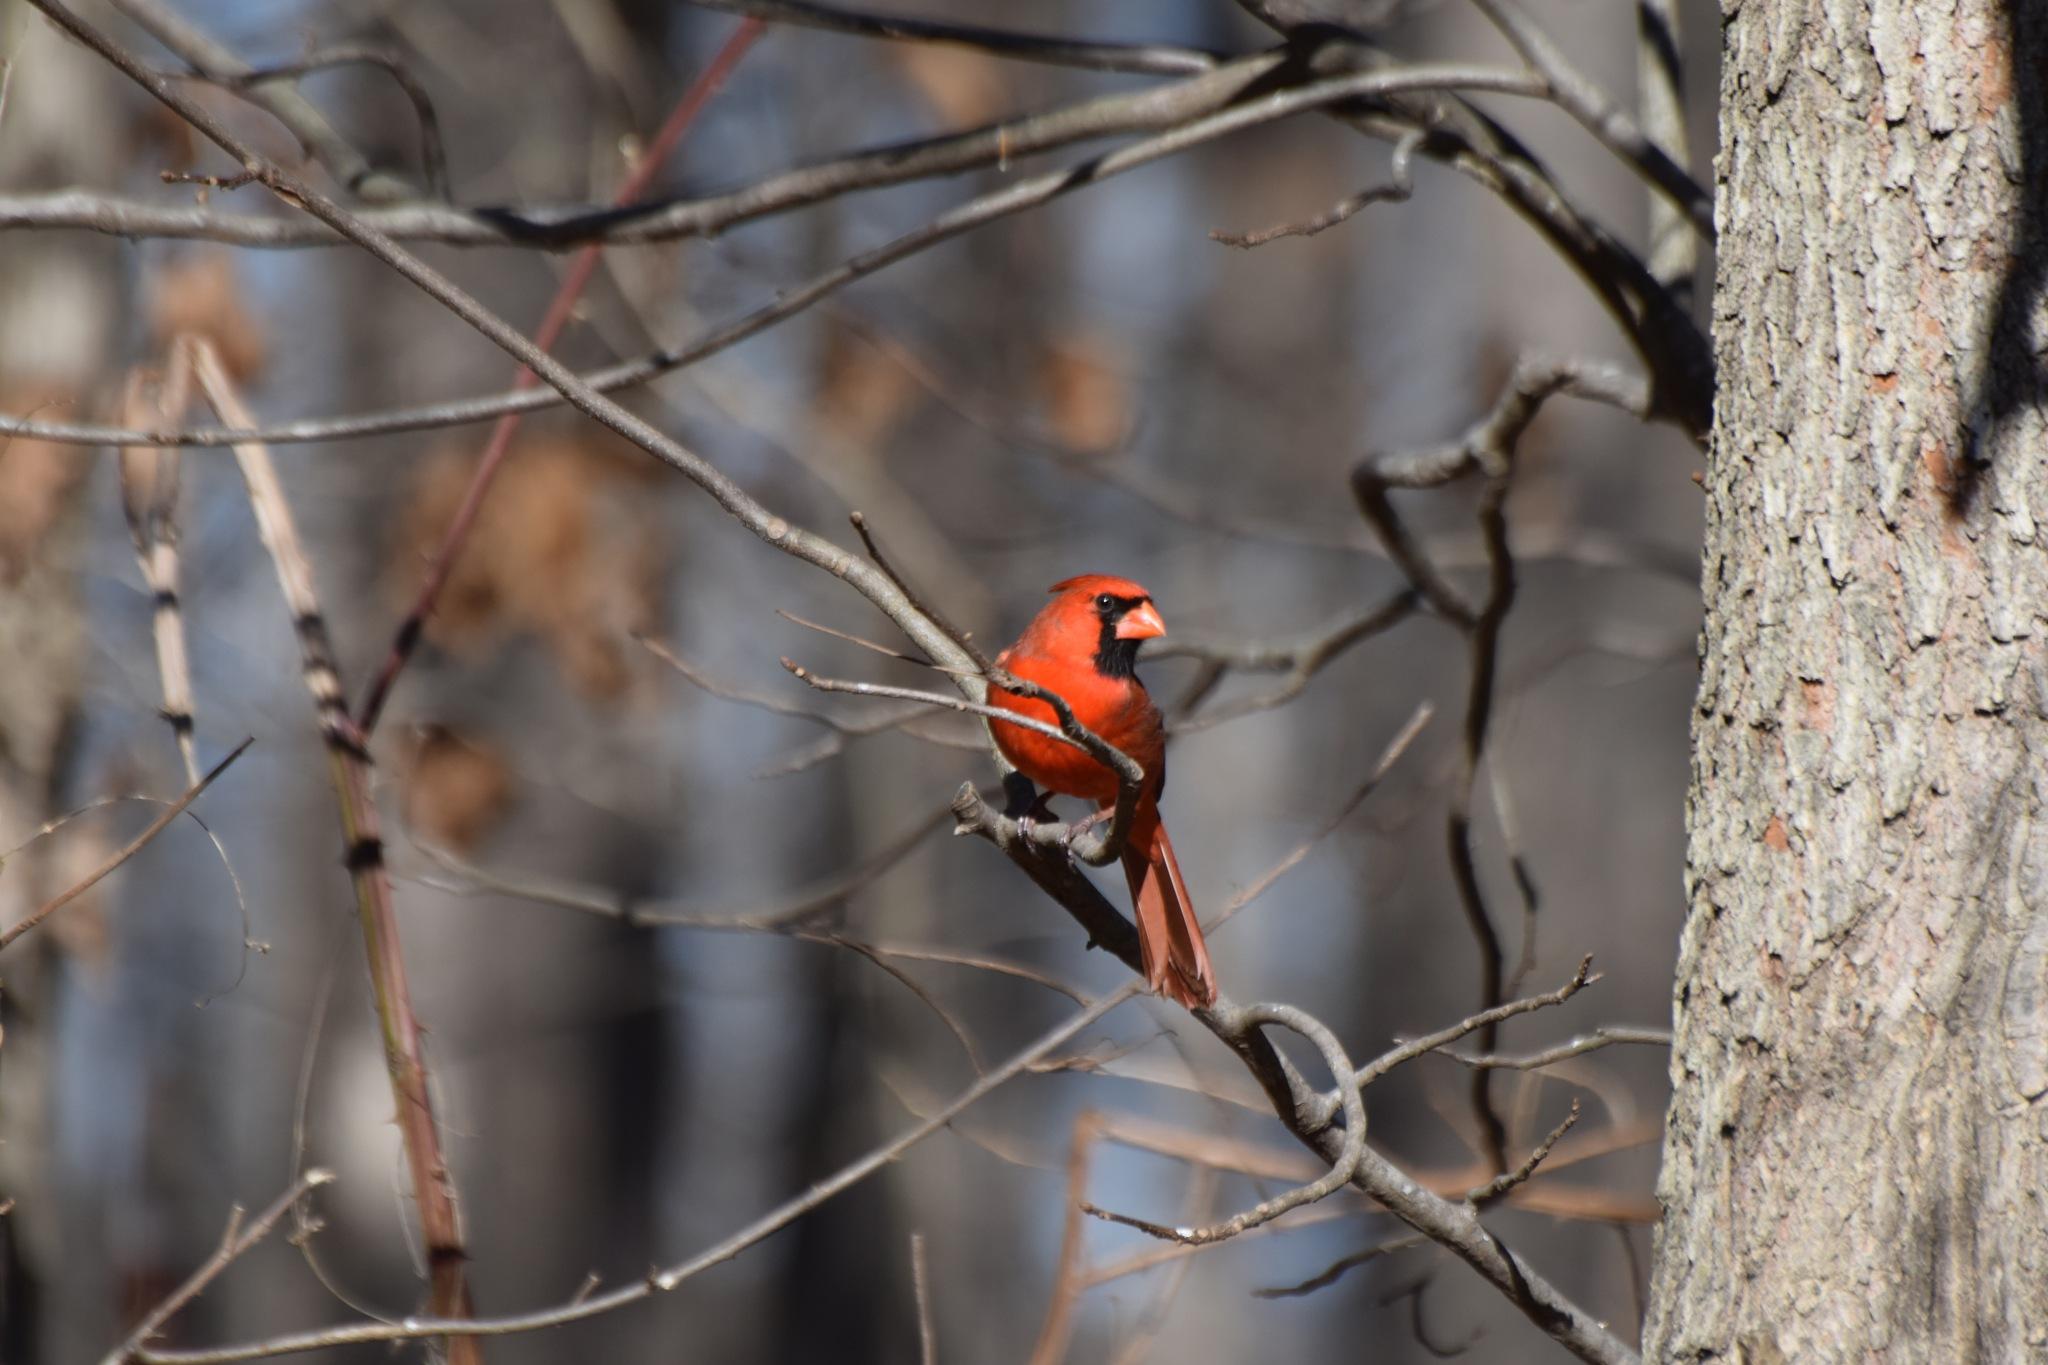 Nature's Birds 1577 by Lawrence Scott Hess